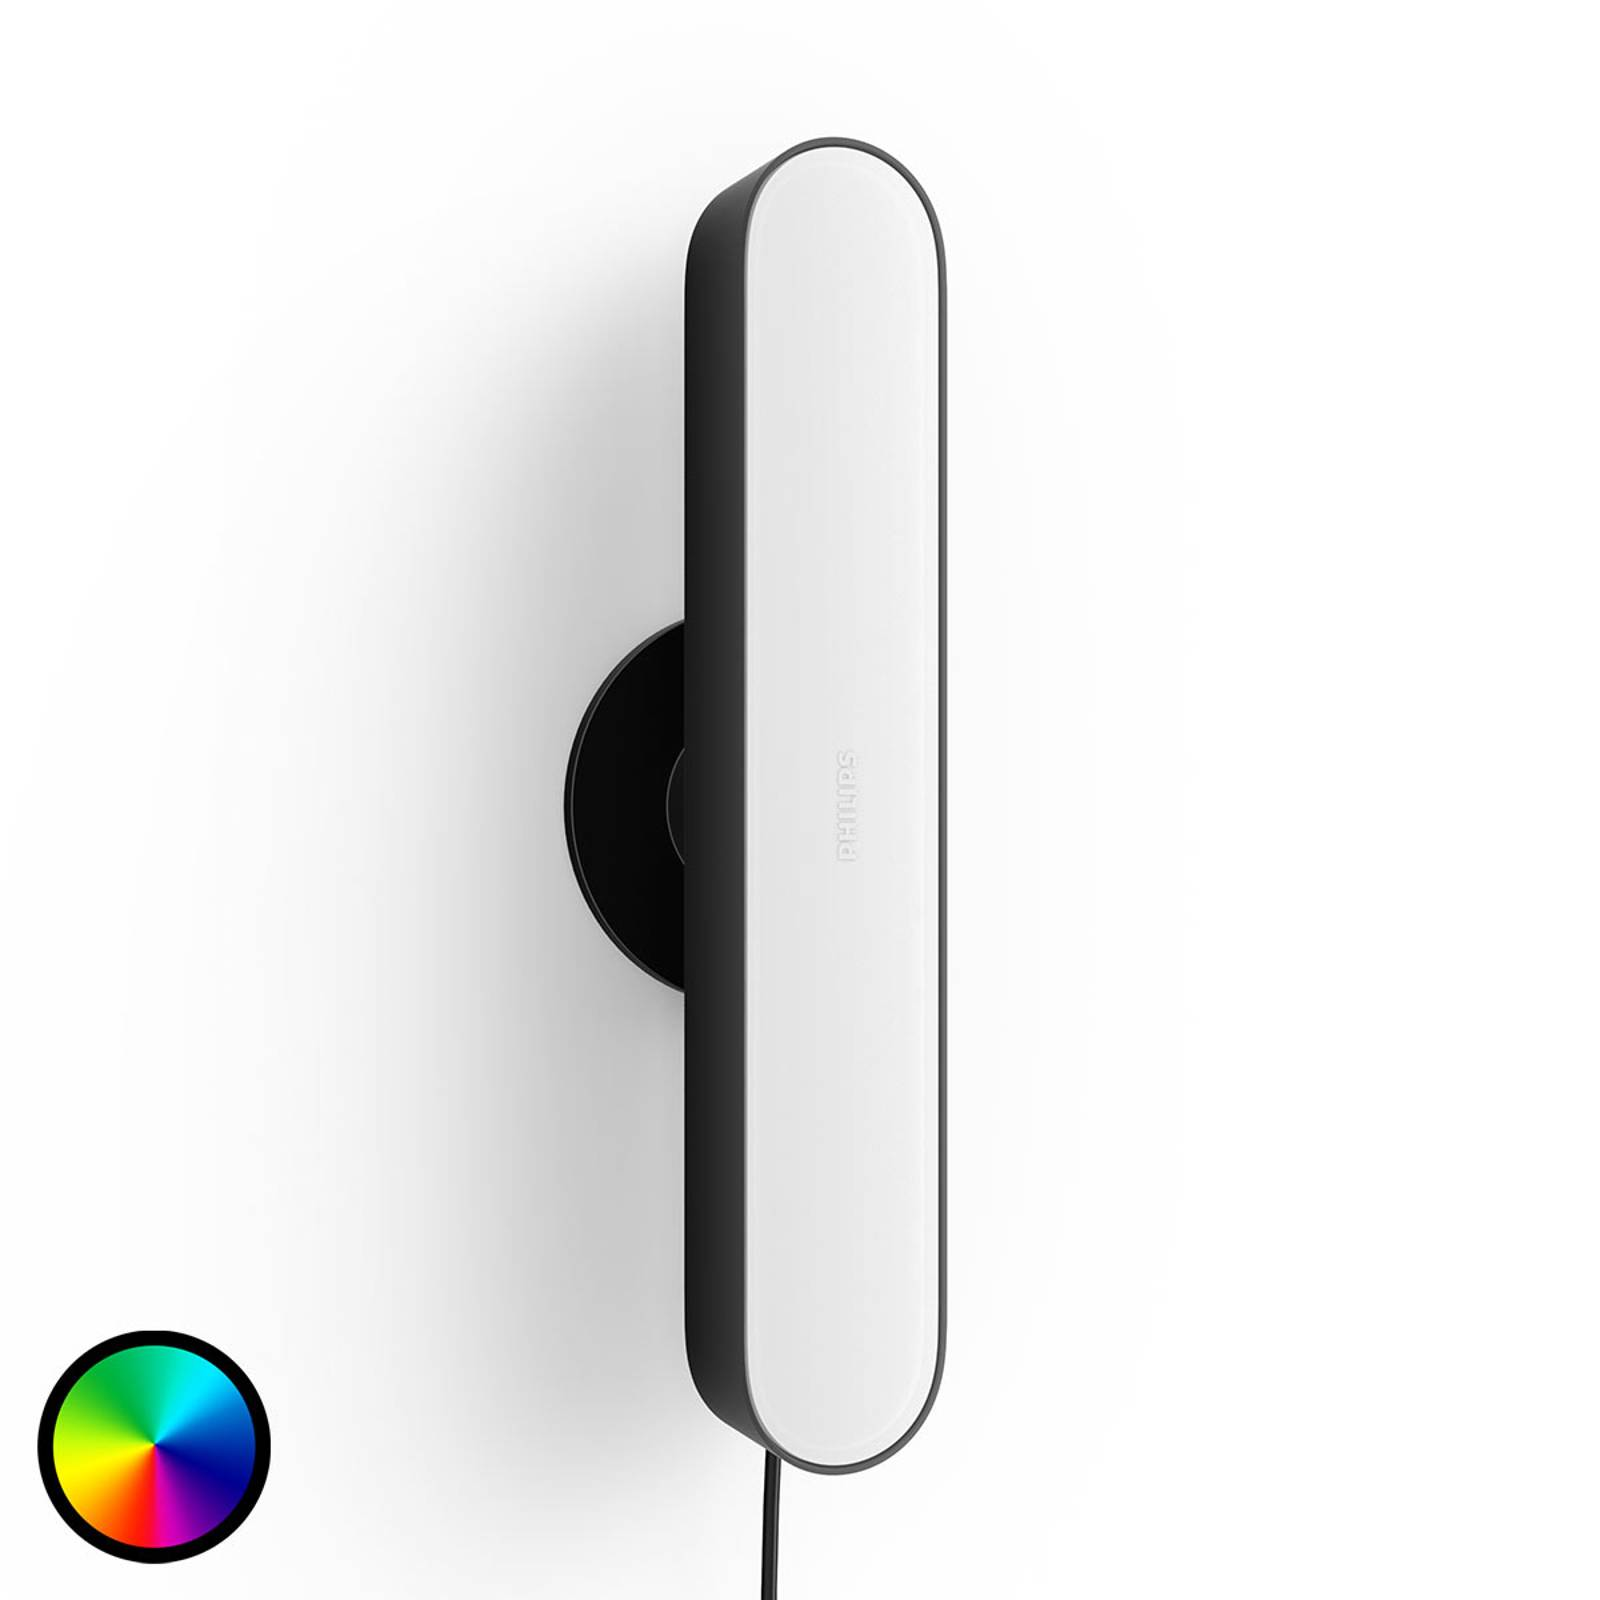 Philips Hue Play Lightbar, utvidgning 1 svart